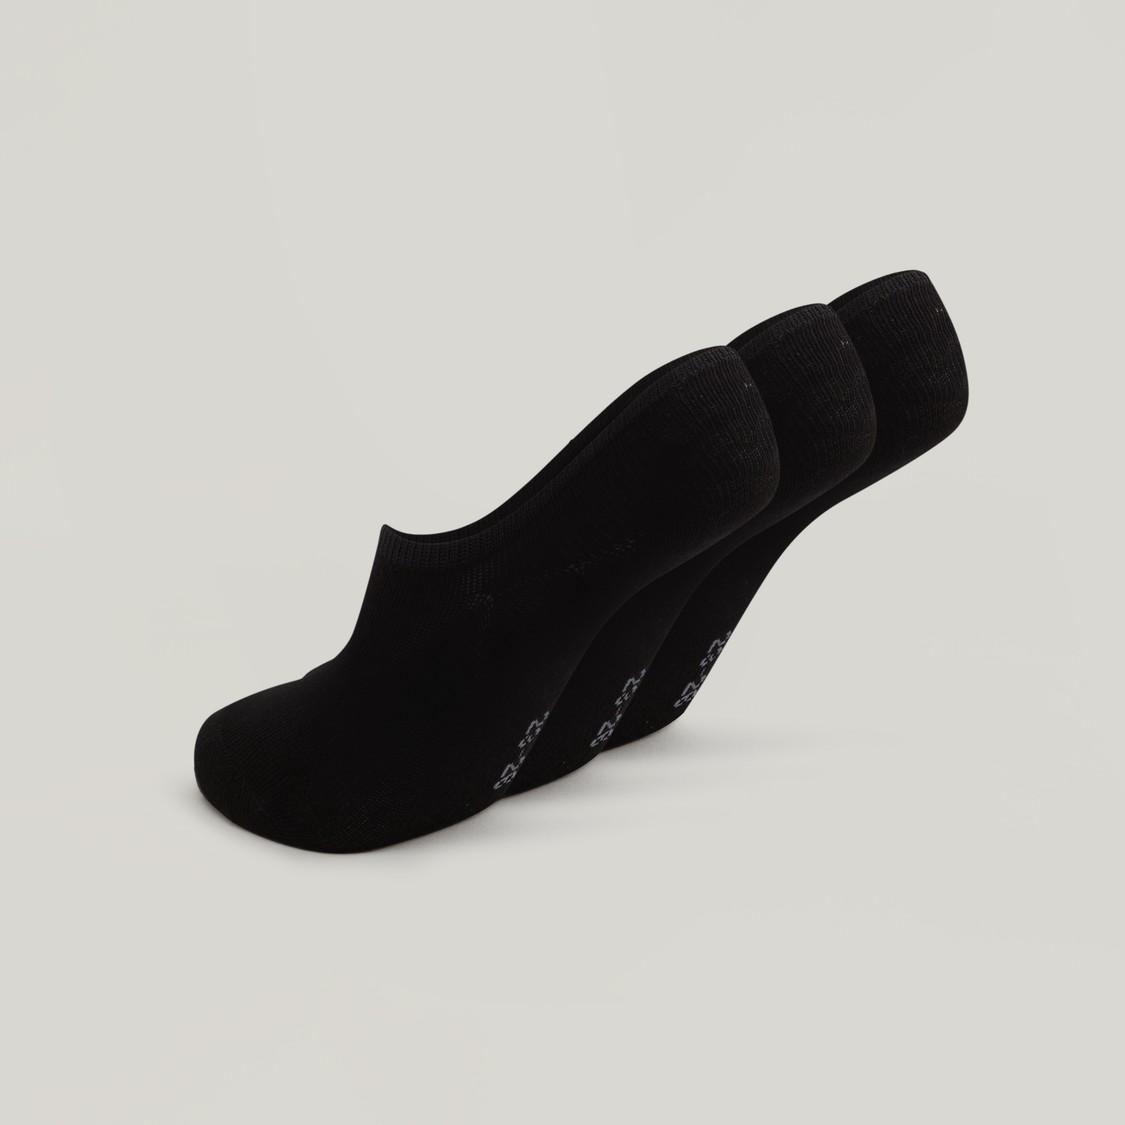 Textured No Show Socks with Elasticised Hem - Set of 3